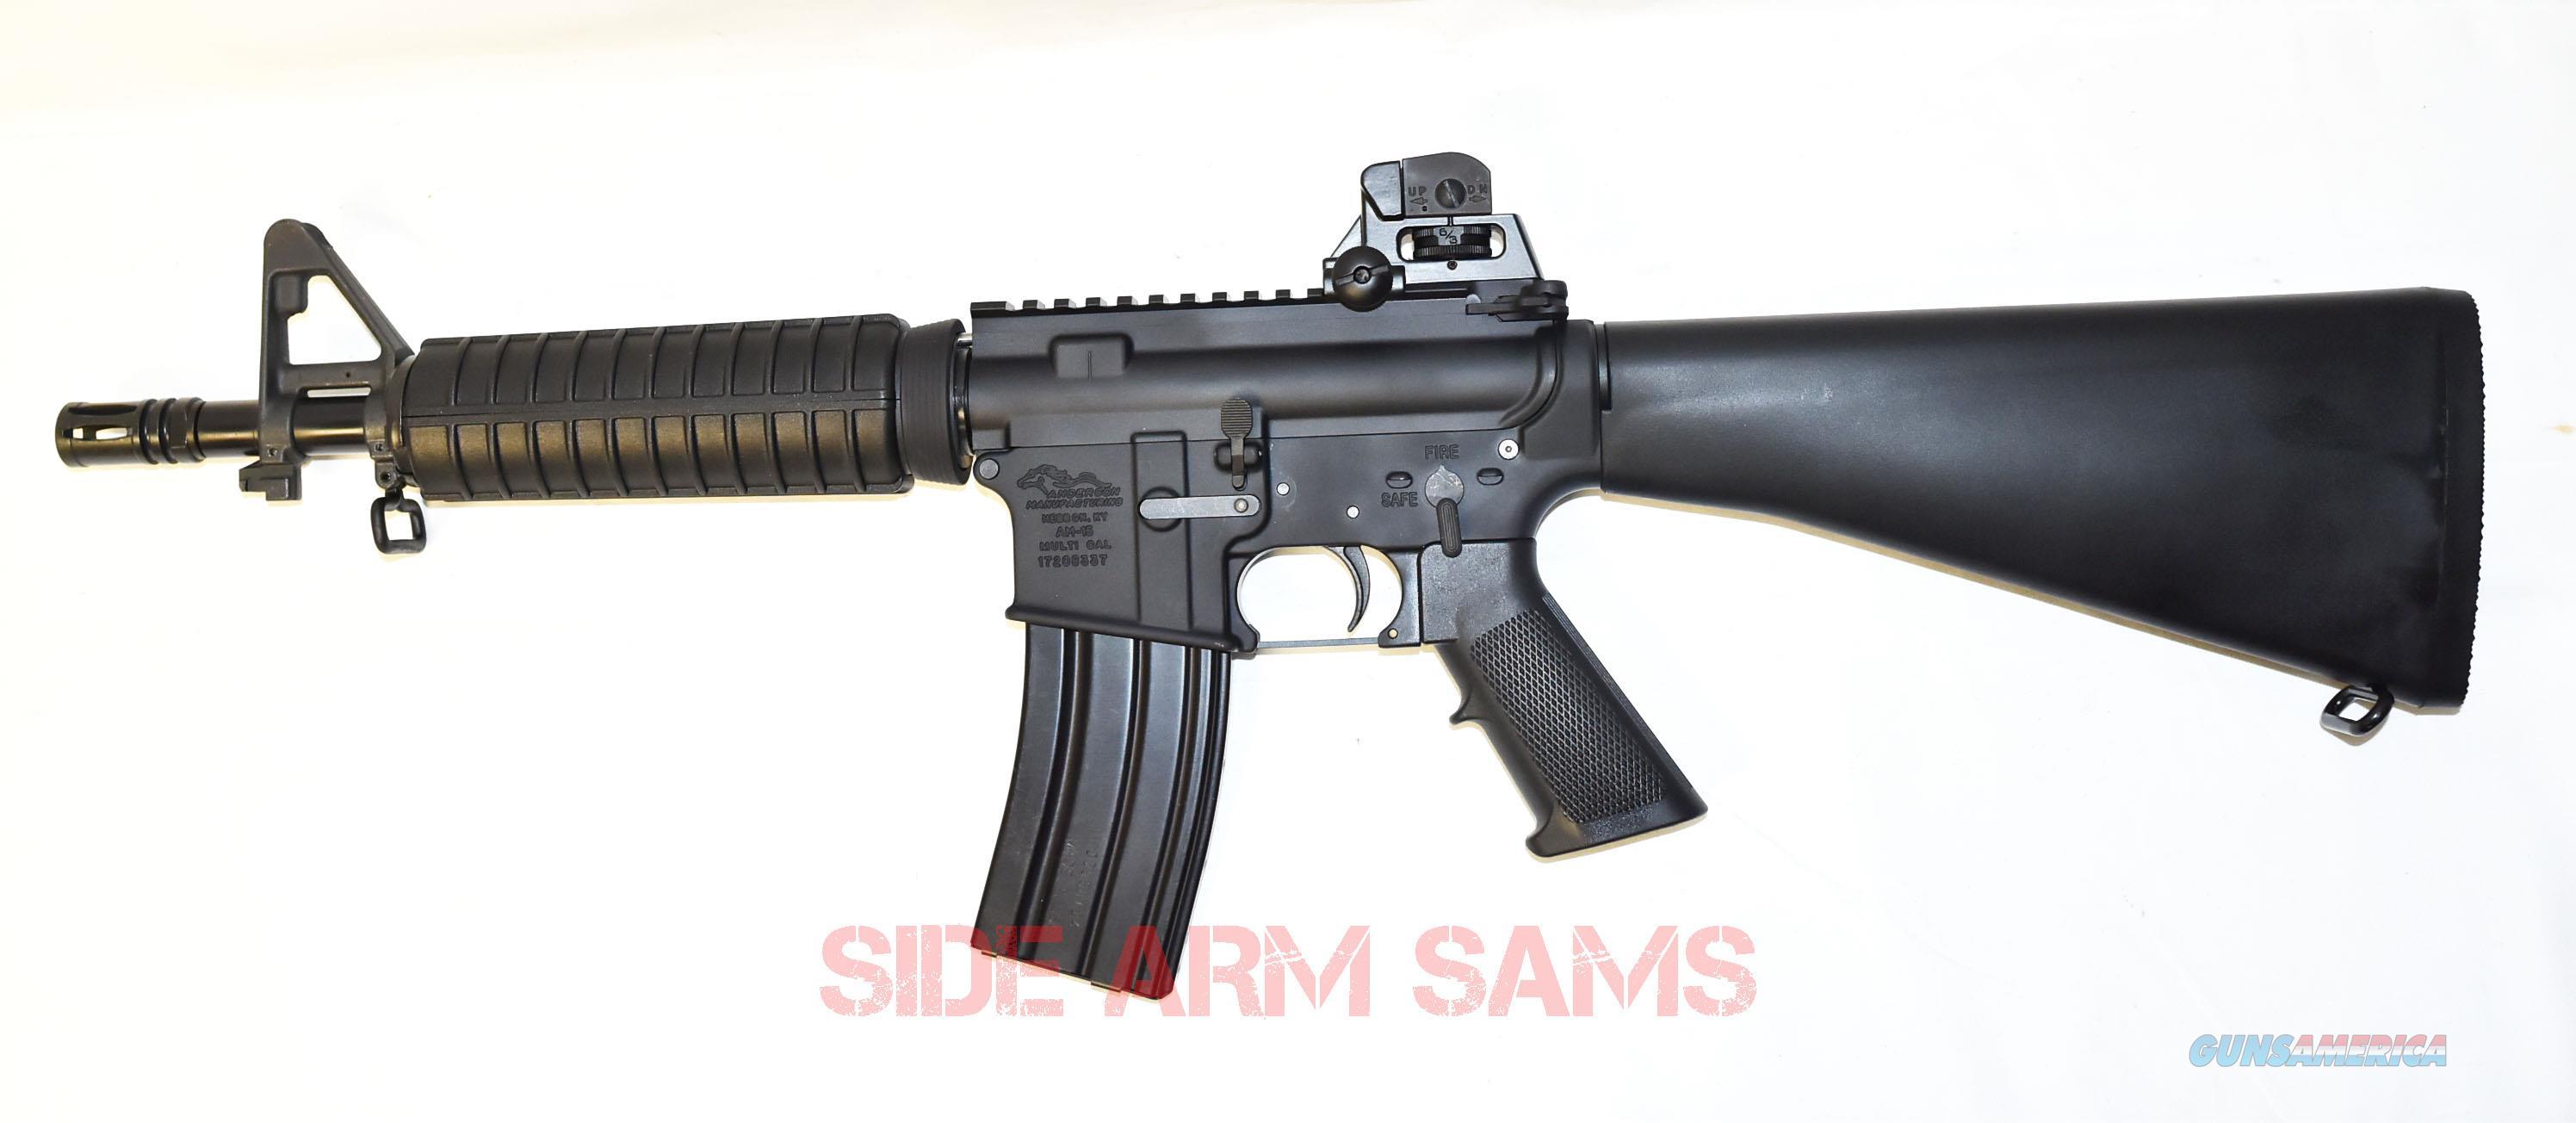 "NIB Anderson AR-15 10.5"" Barrel 5.56 NATO Short Barrel Rifle (SBR)  Guns > Rifles > Class 3 Rifles > Class 3 Subguns"